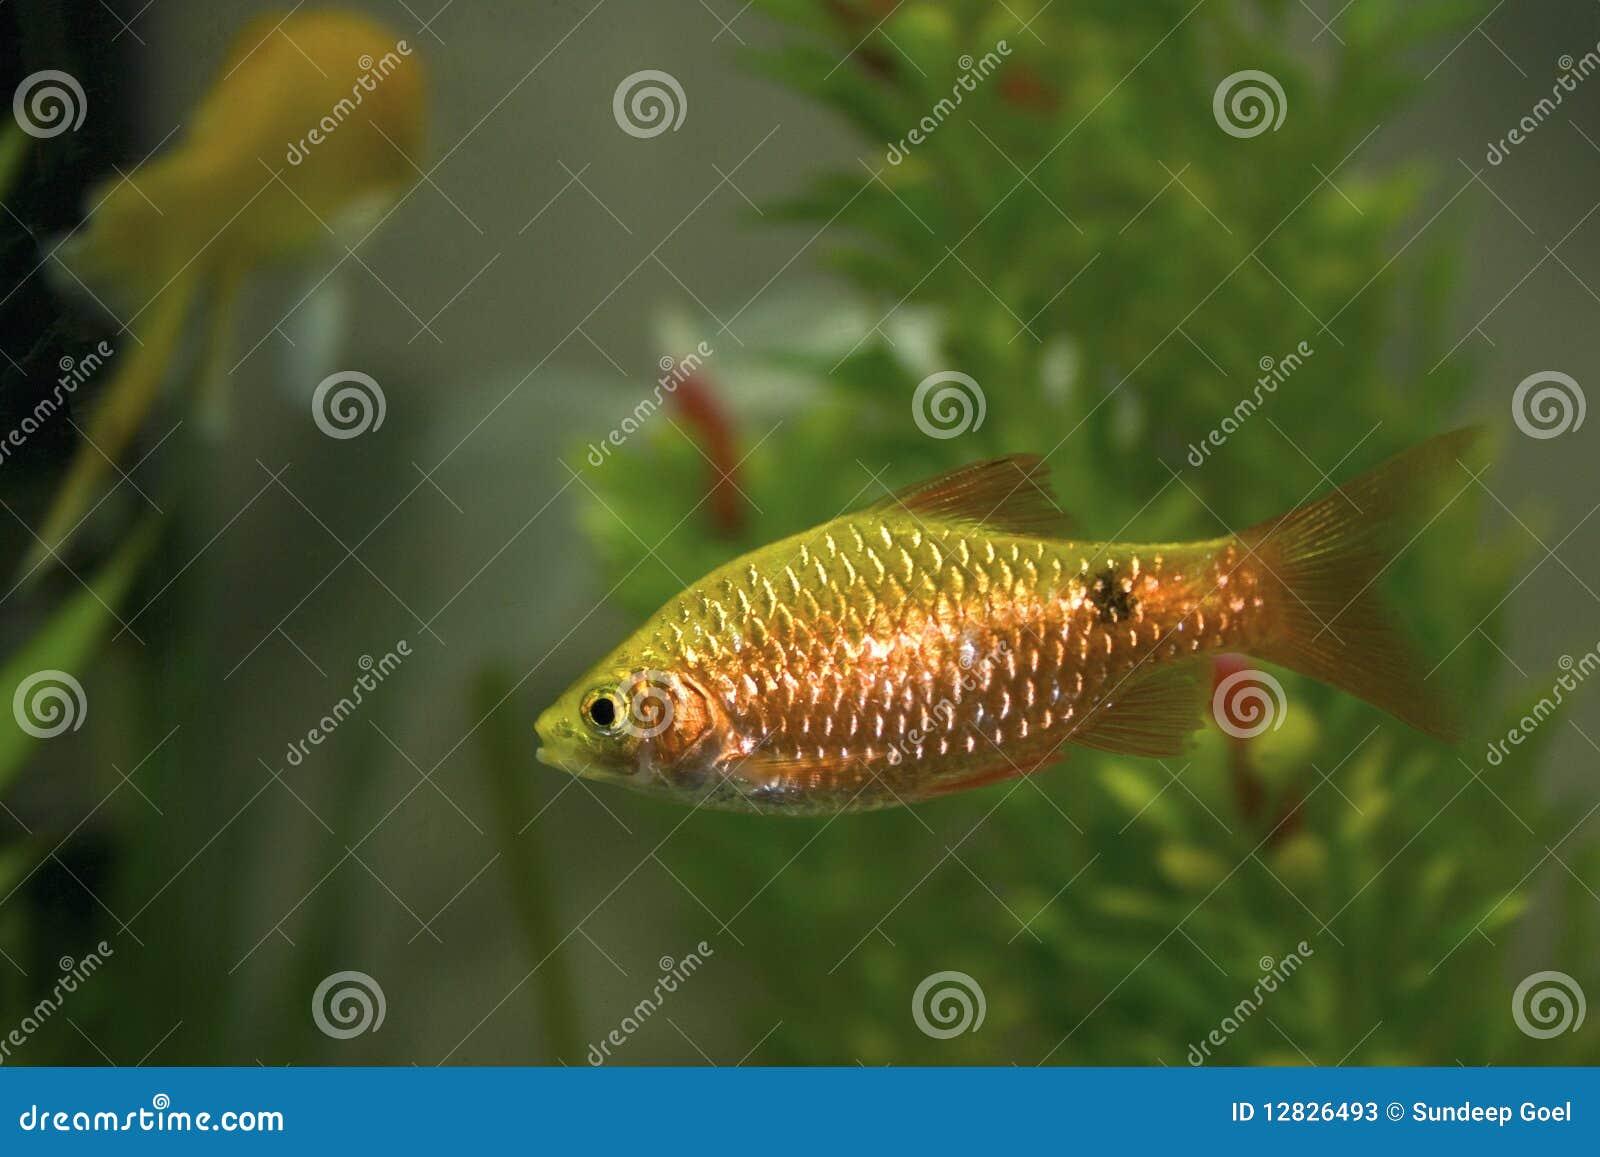 Gold barb in an aquarium tank stock photos image 12826493 for Gold barb fish